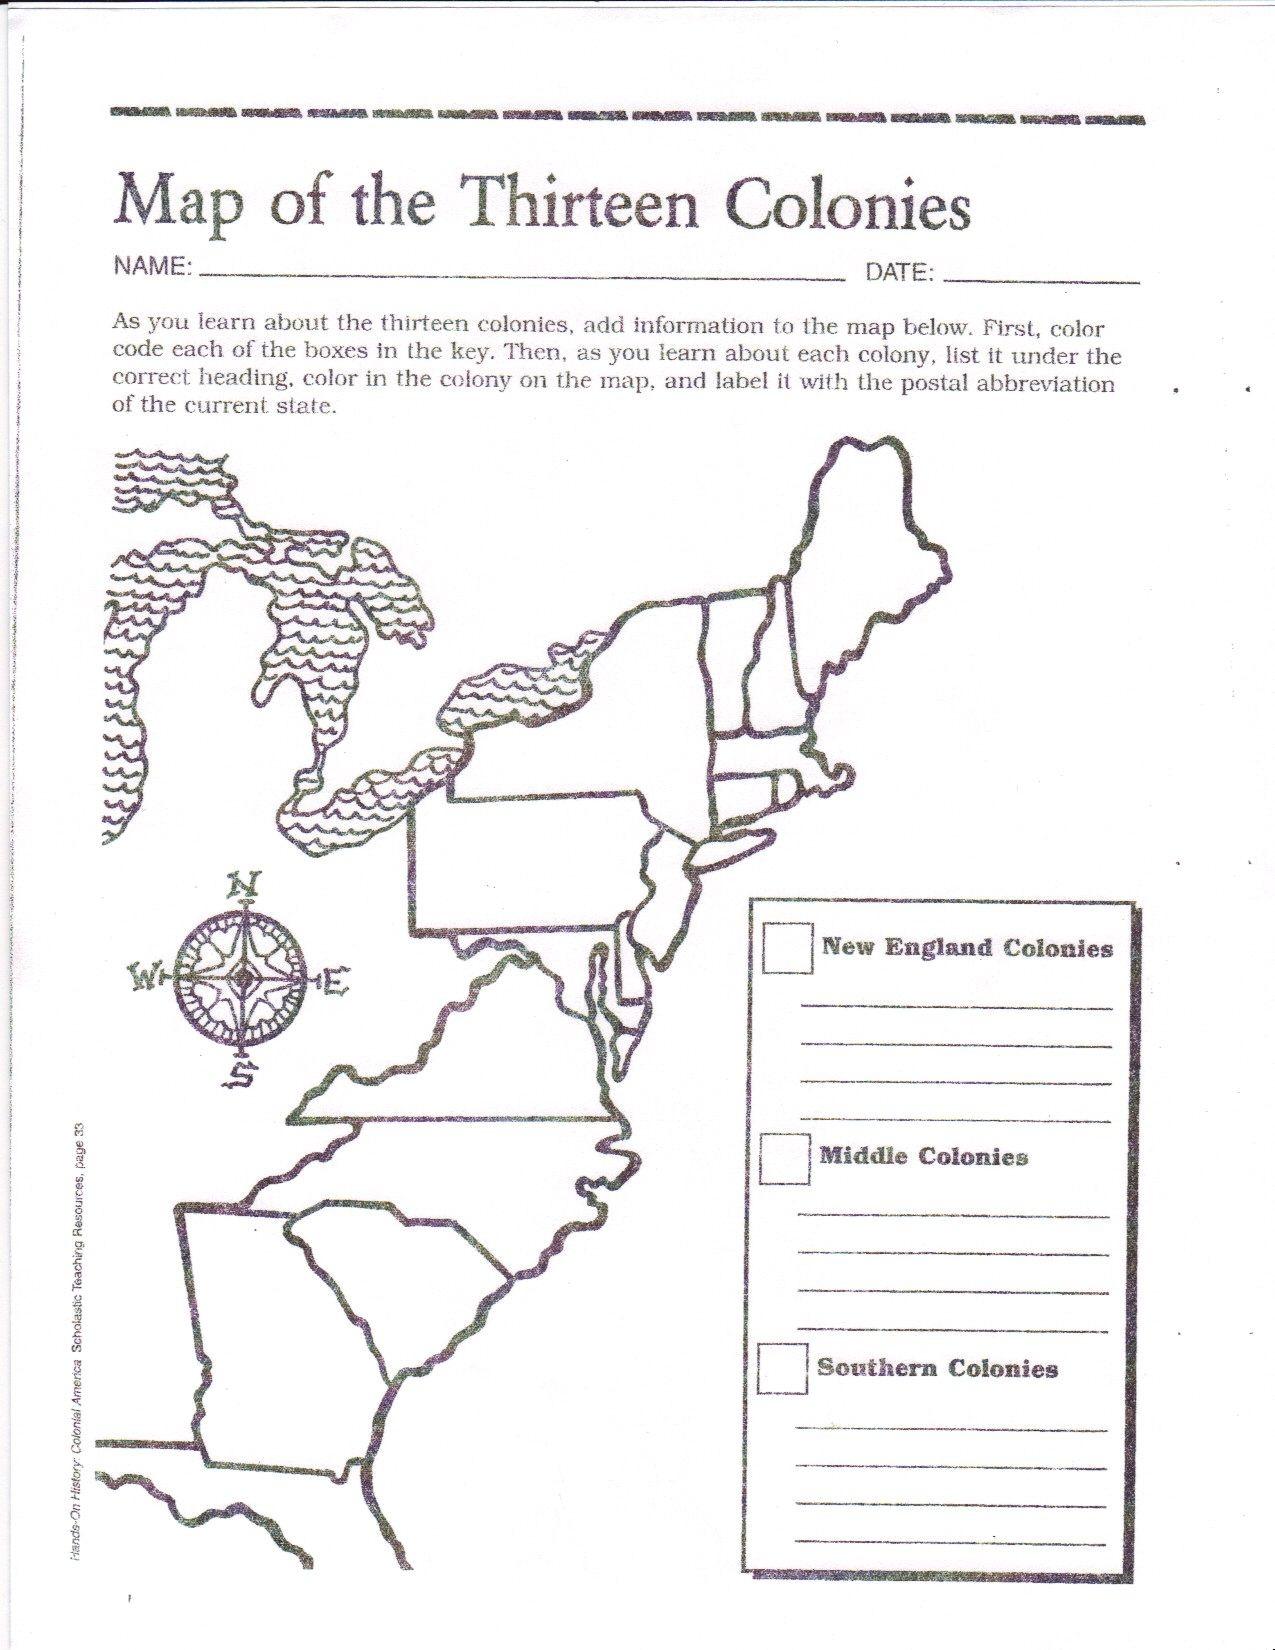 graphic regarding Printable Map of New England called 13 Colonies Blank Map Printable Printable Maps